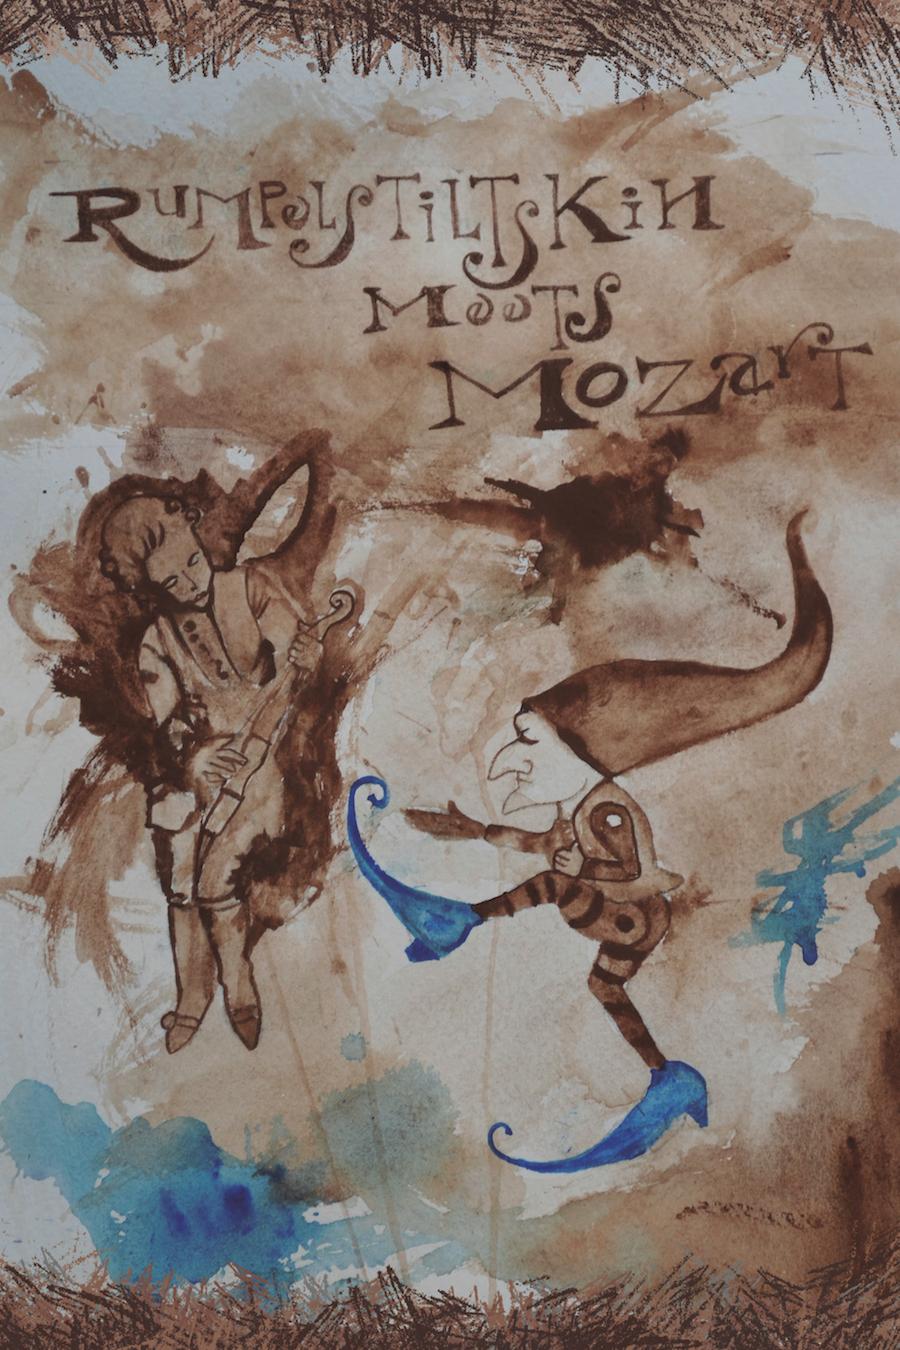 Rumpelstiltskin Meets Mozart Hobuco Luis Macias.jpeg